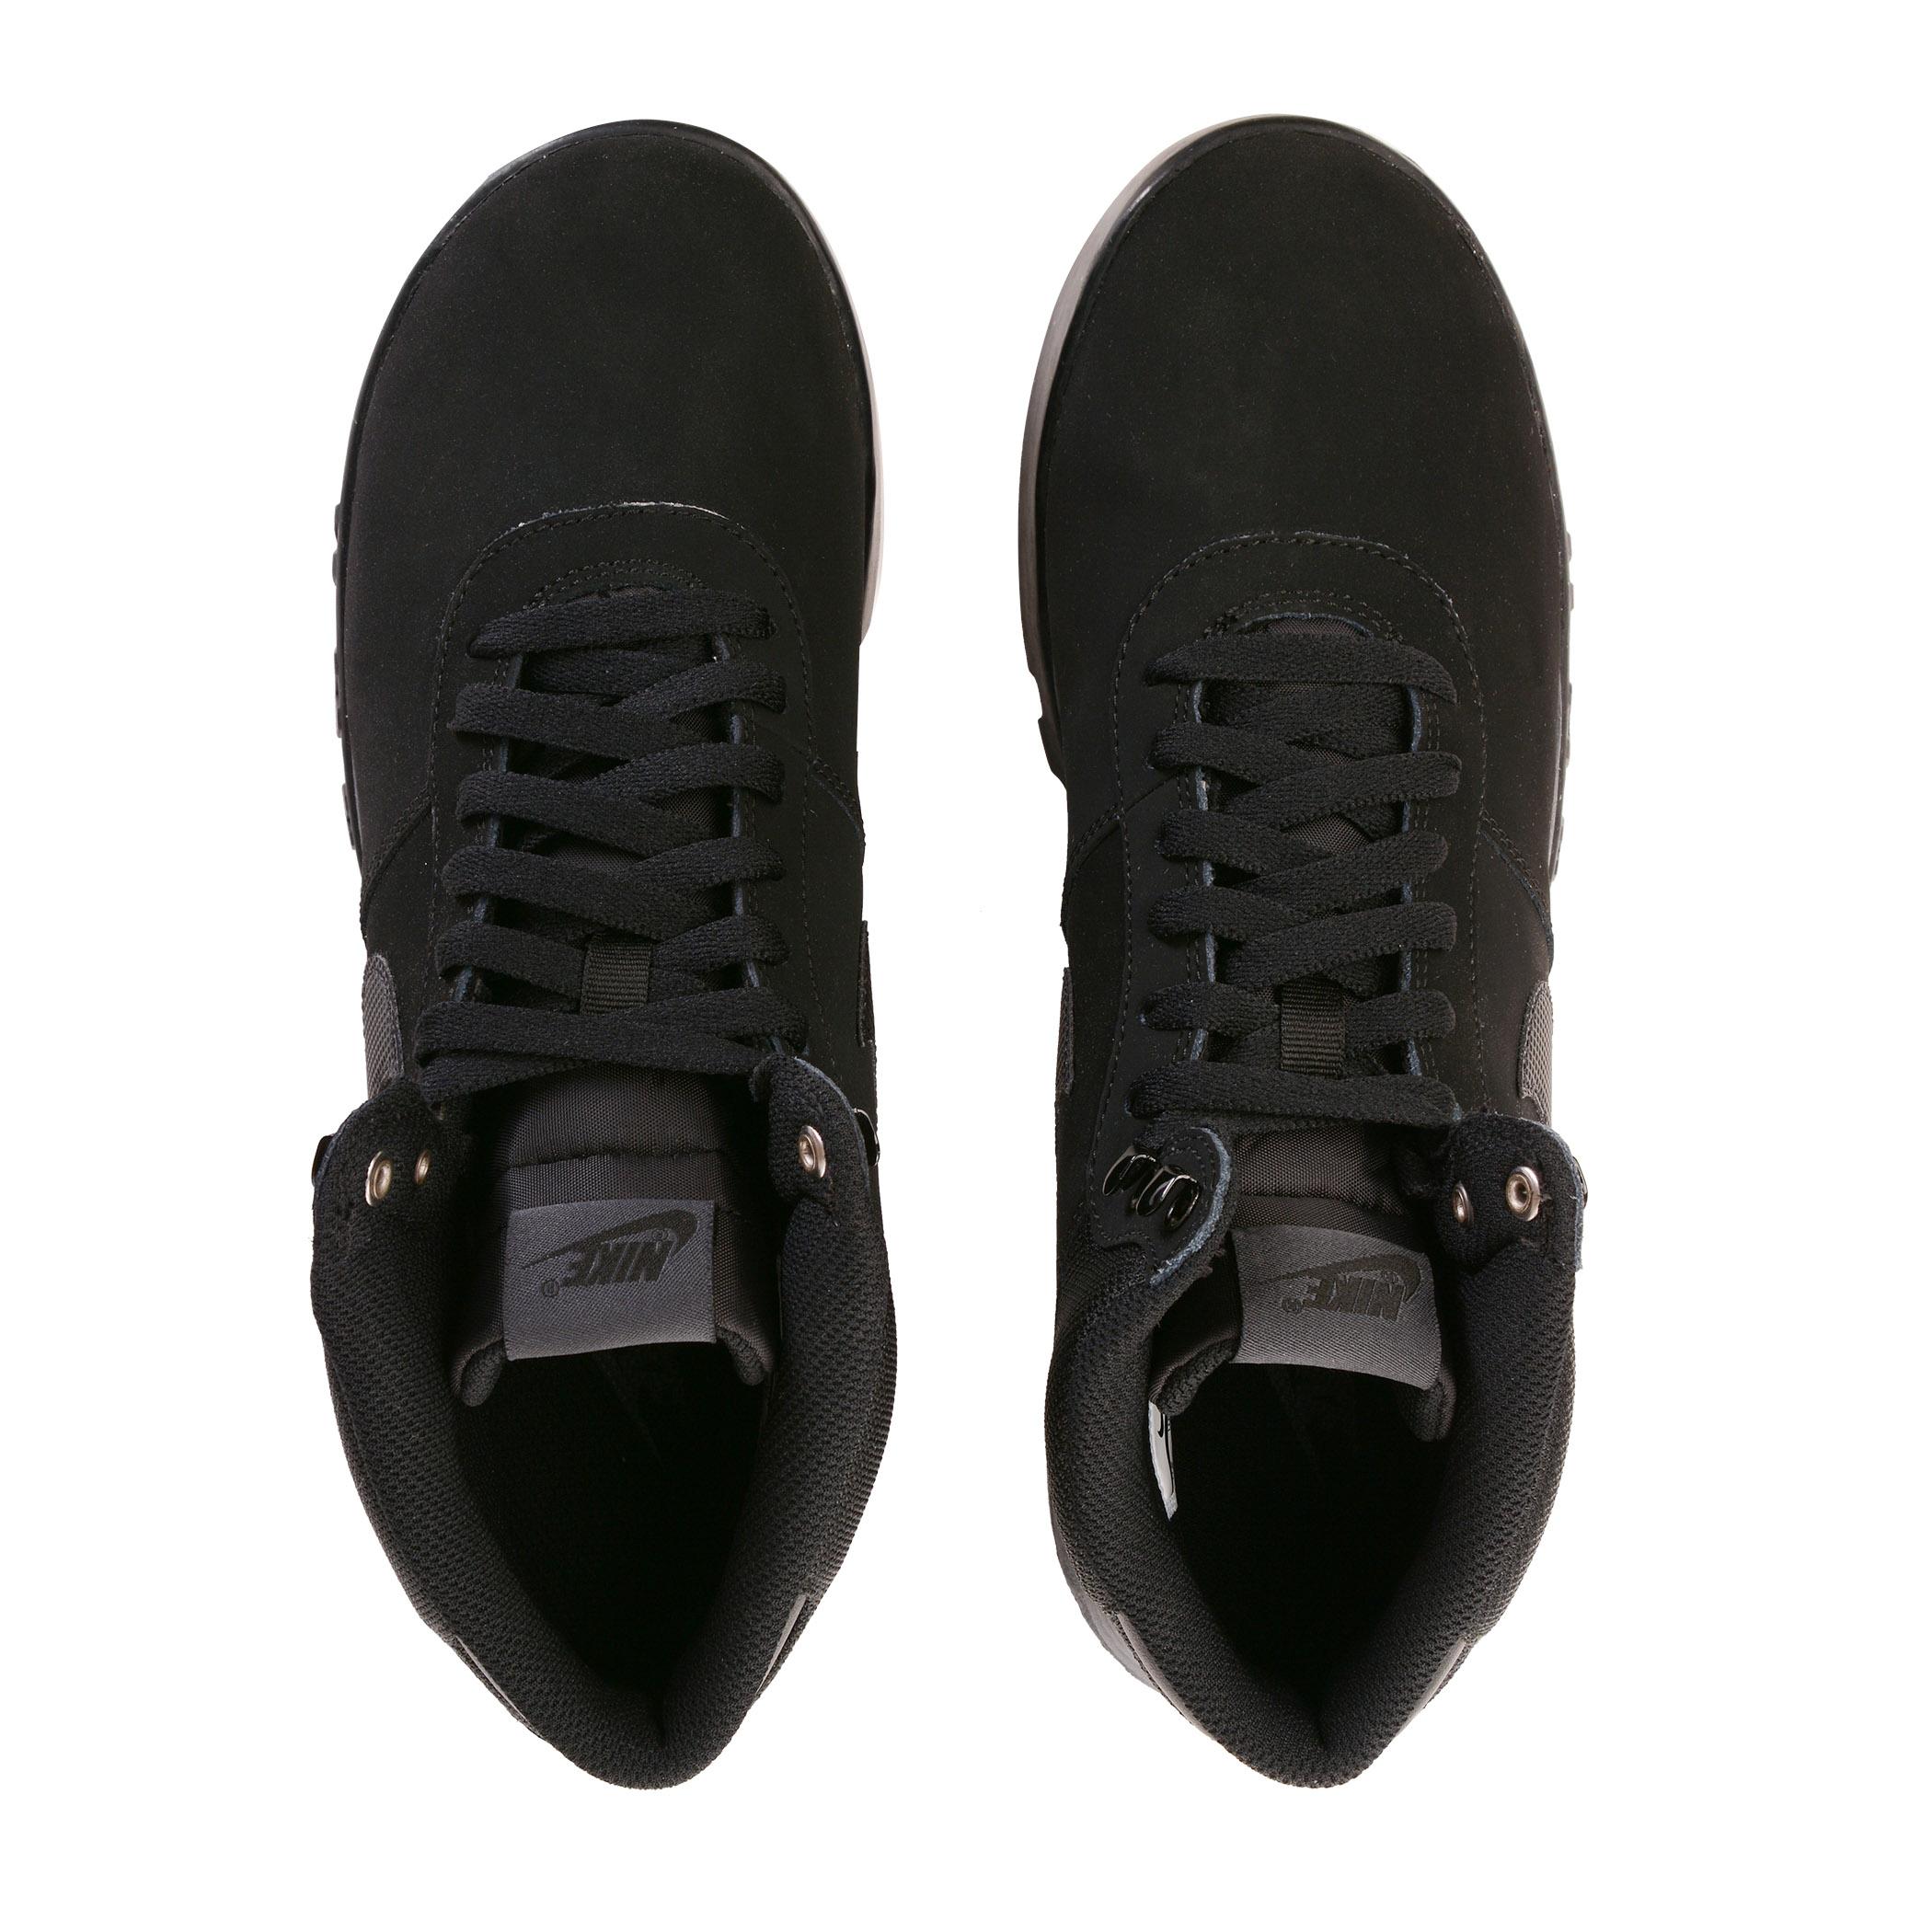 ba2c0c94 Мужские ботинки Nike Hoodland Suede Black/Black-Anthracite - фото 6